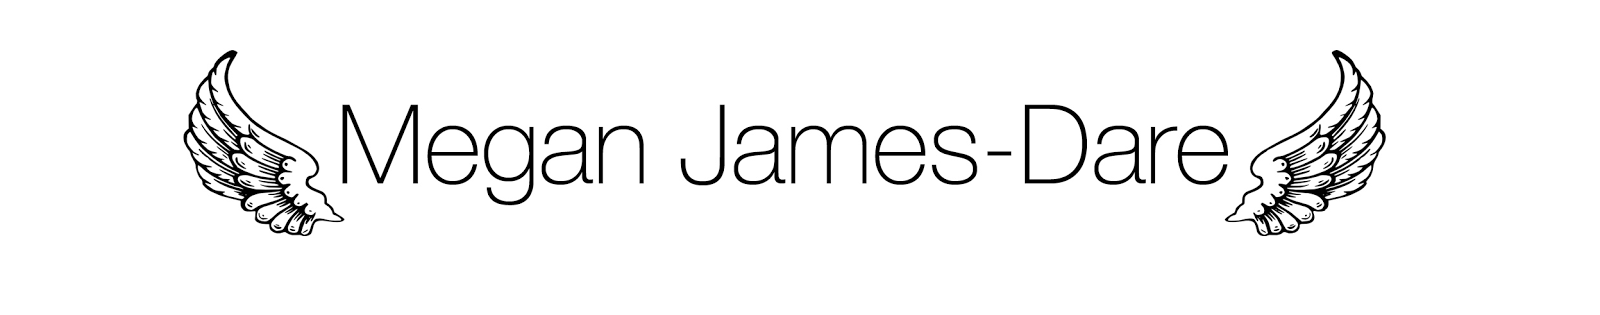 Megan James-Dare - Personal Style Blog